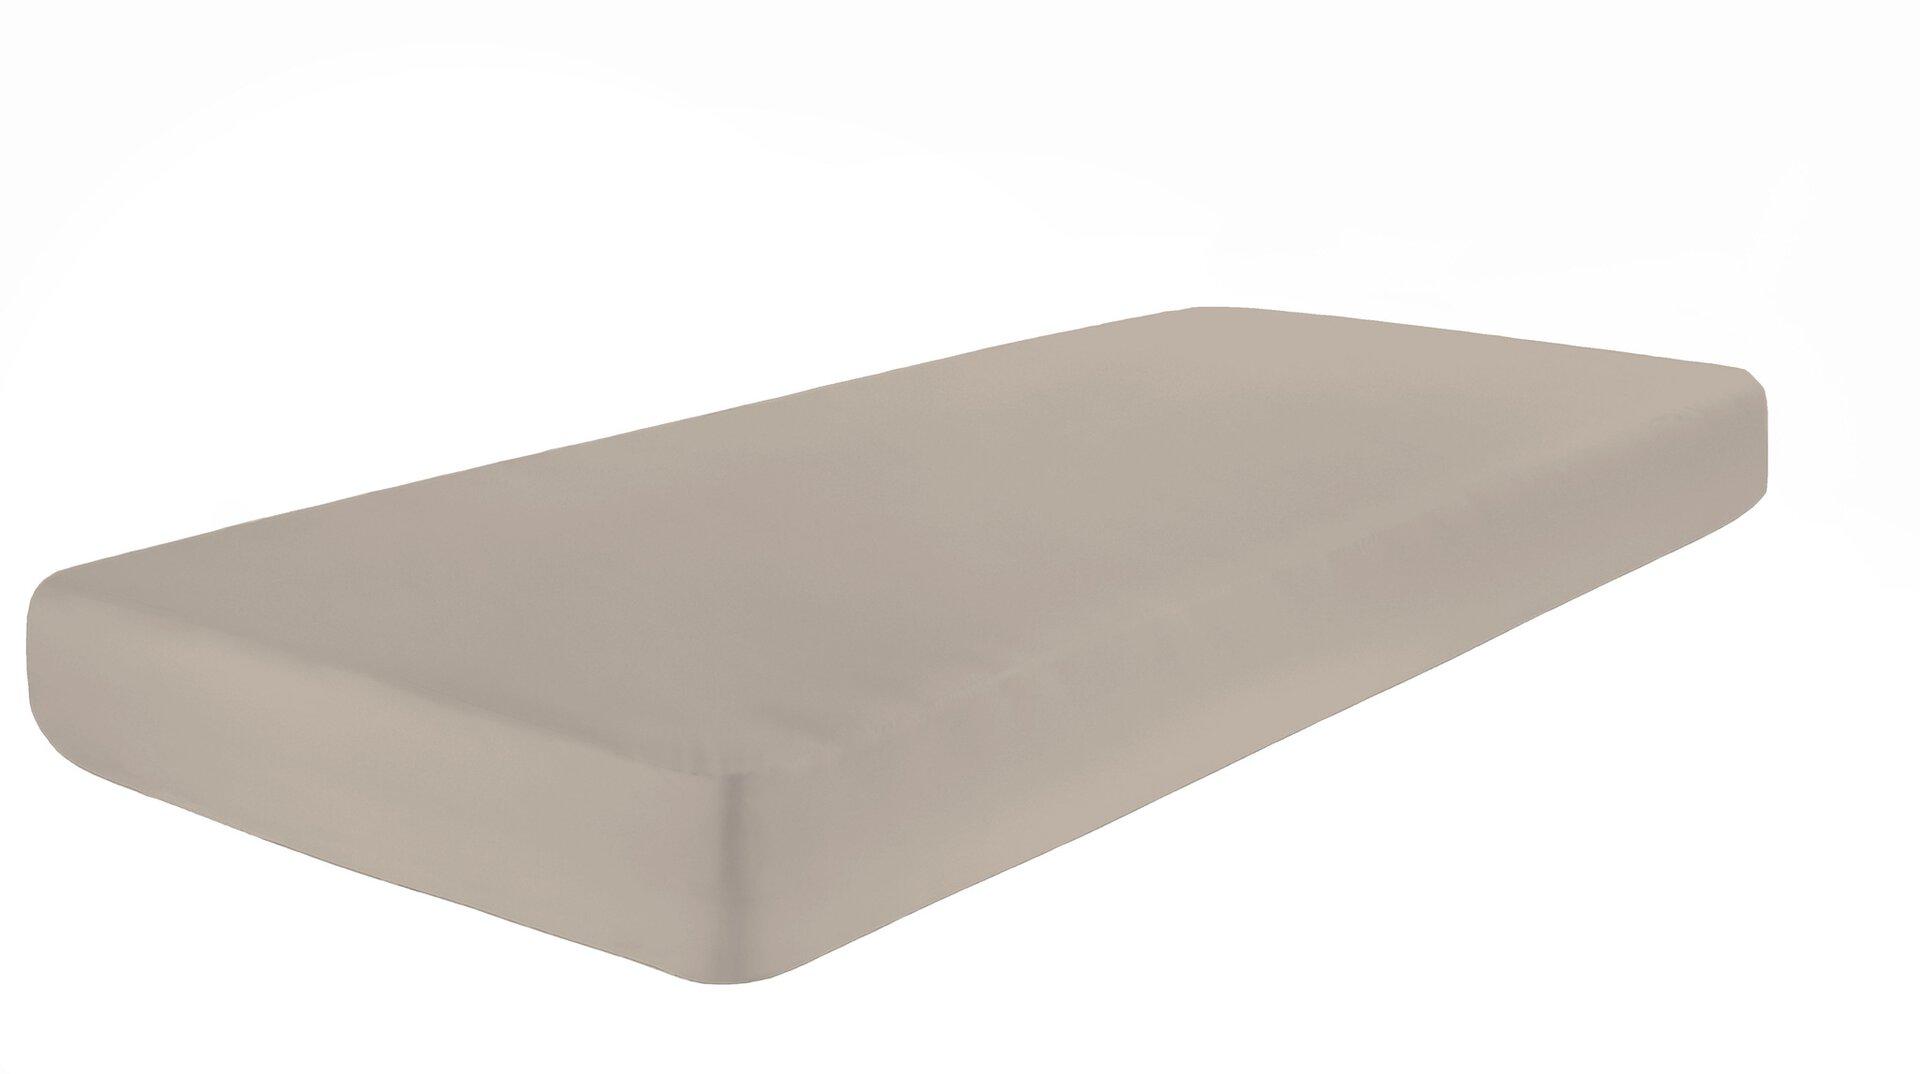 Elastan Jersey Boxspring-Spannbetttuch Pro Night Textil 2 x 2 cm